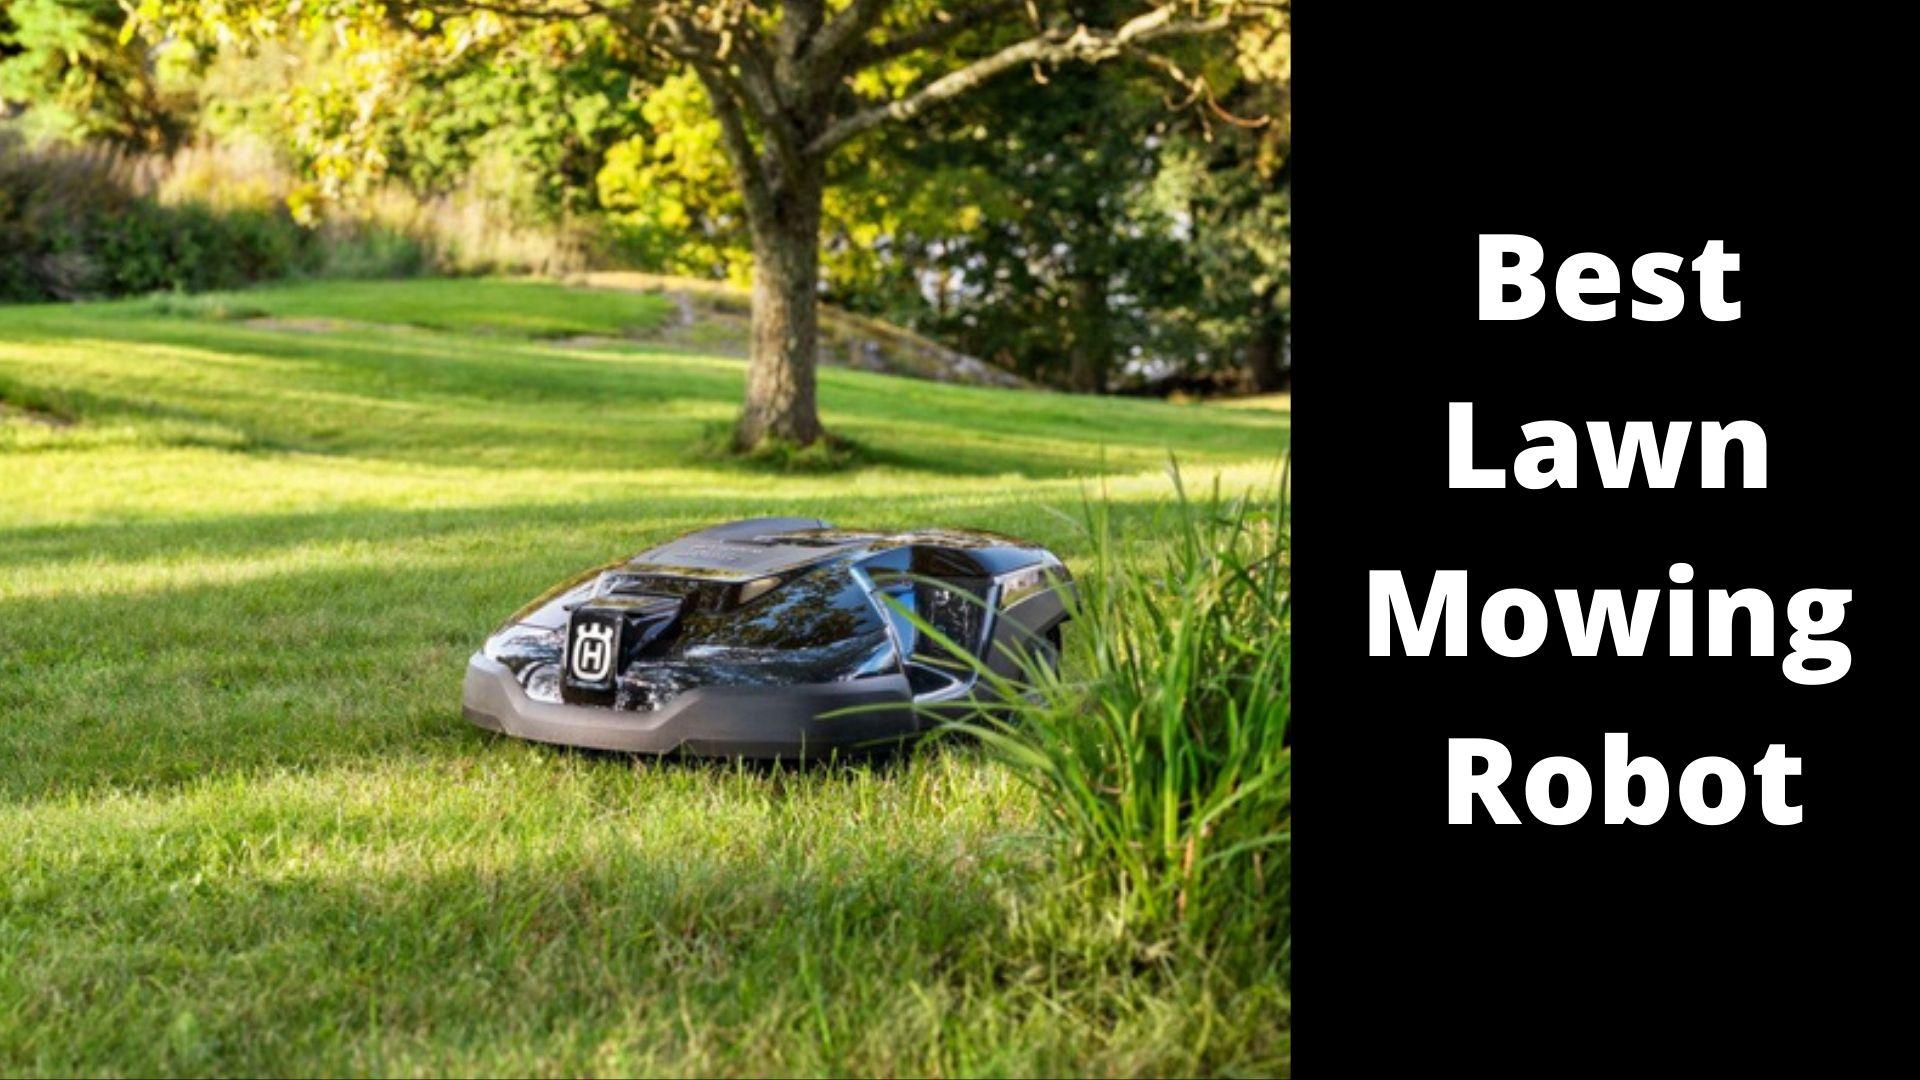 Best Lawn-Mowing Robot